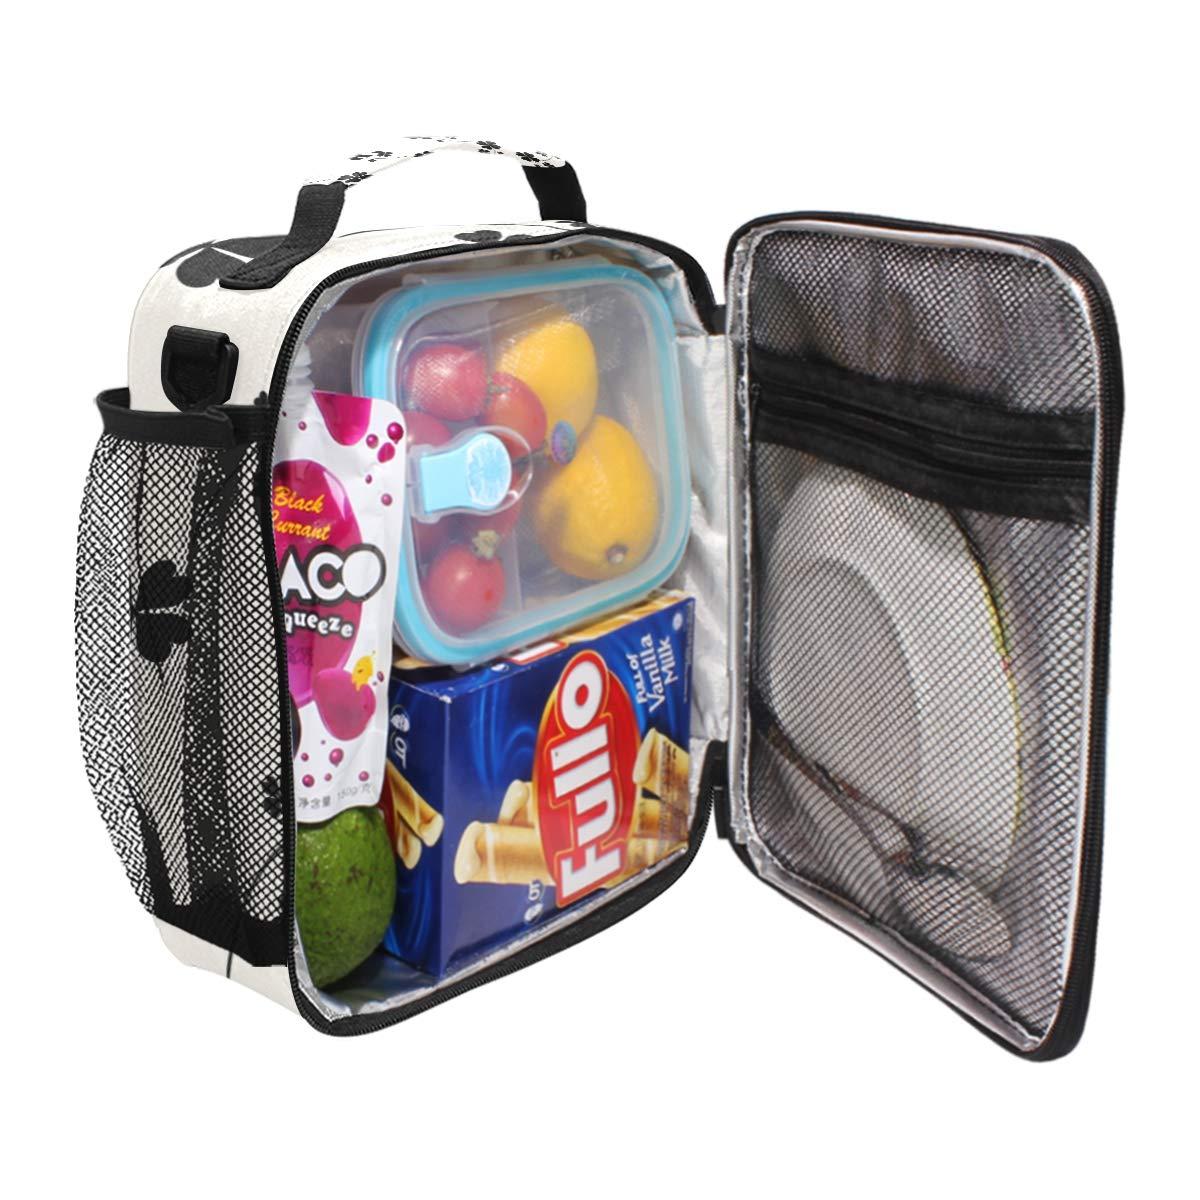 0c7e85fc9cf7 Amazon.com: FAJRO Black Clover Lunch Tote Bag Insulated Thermal ...